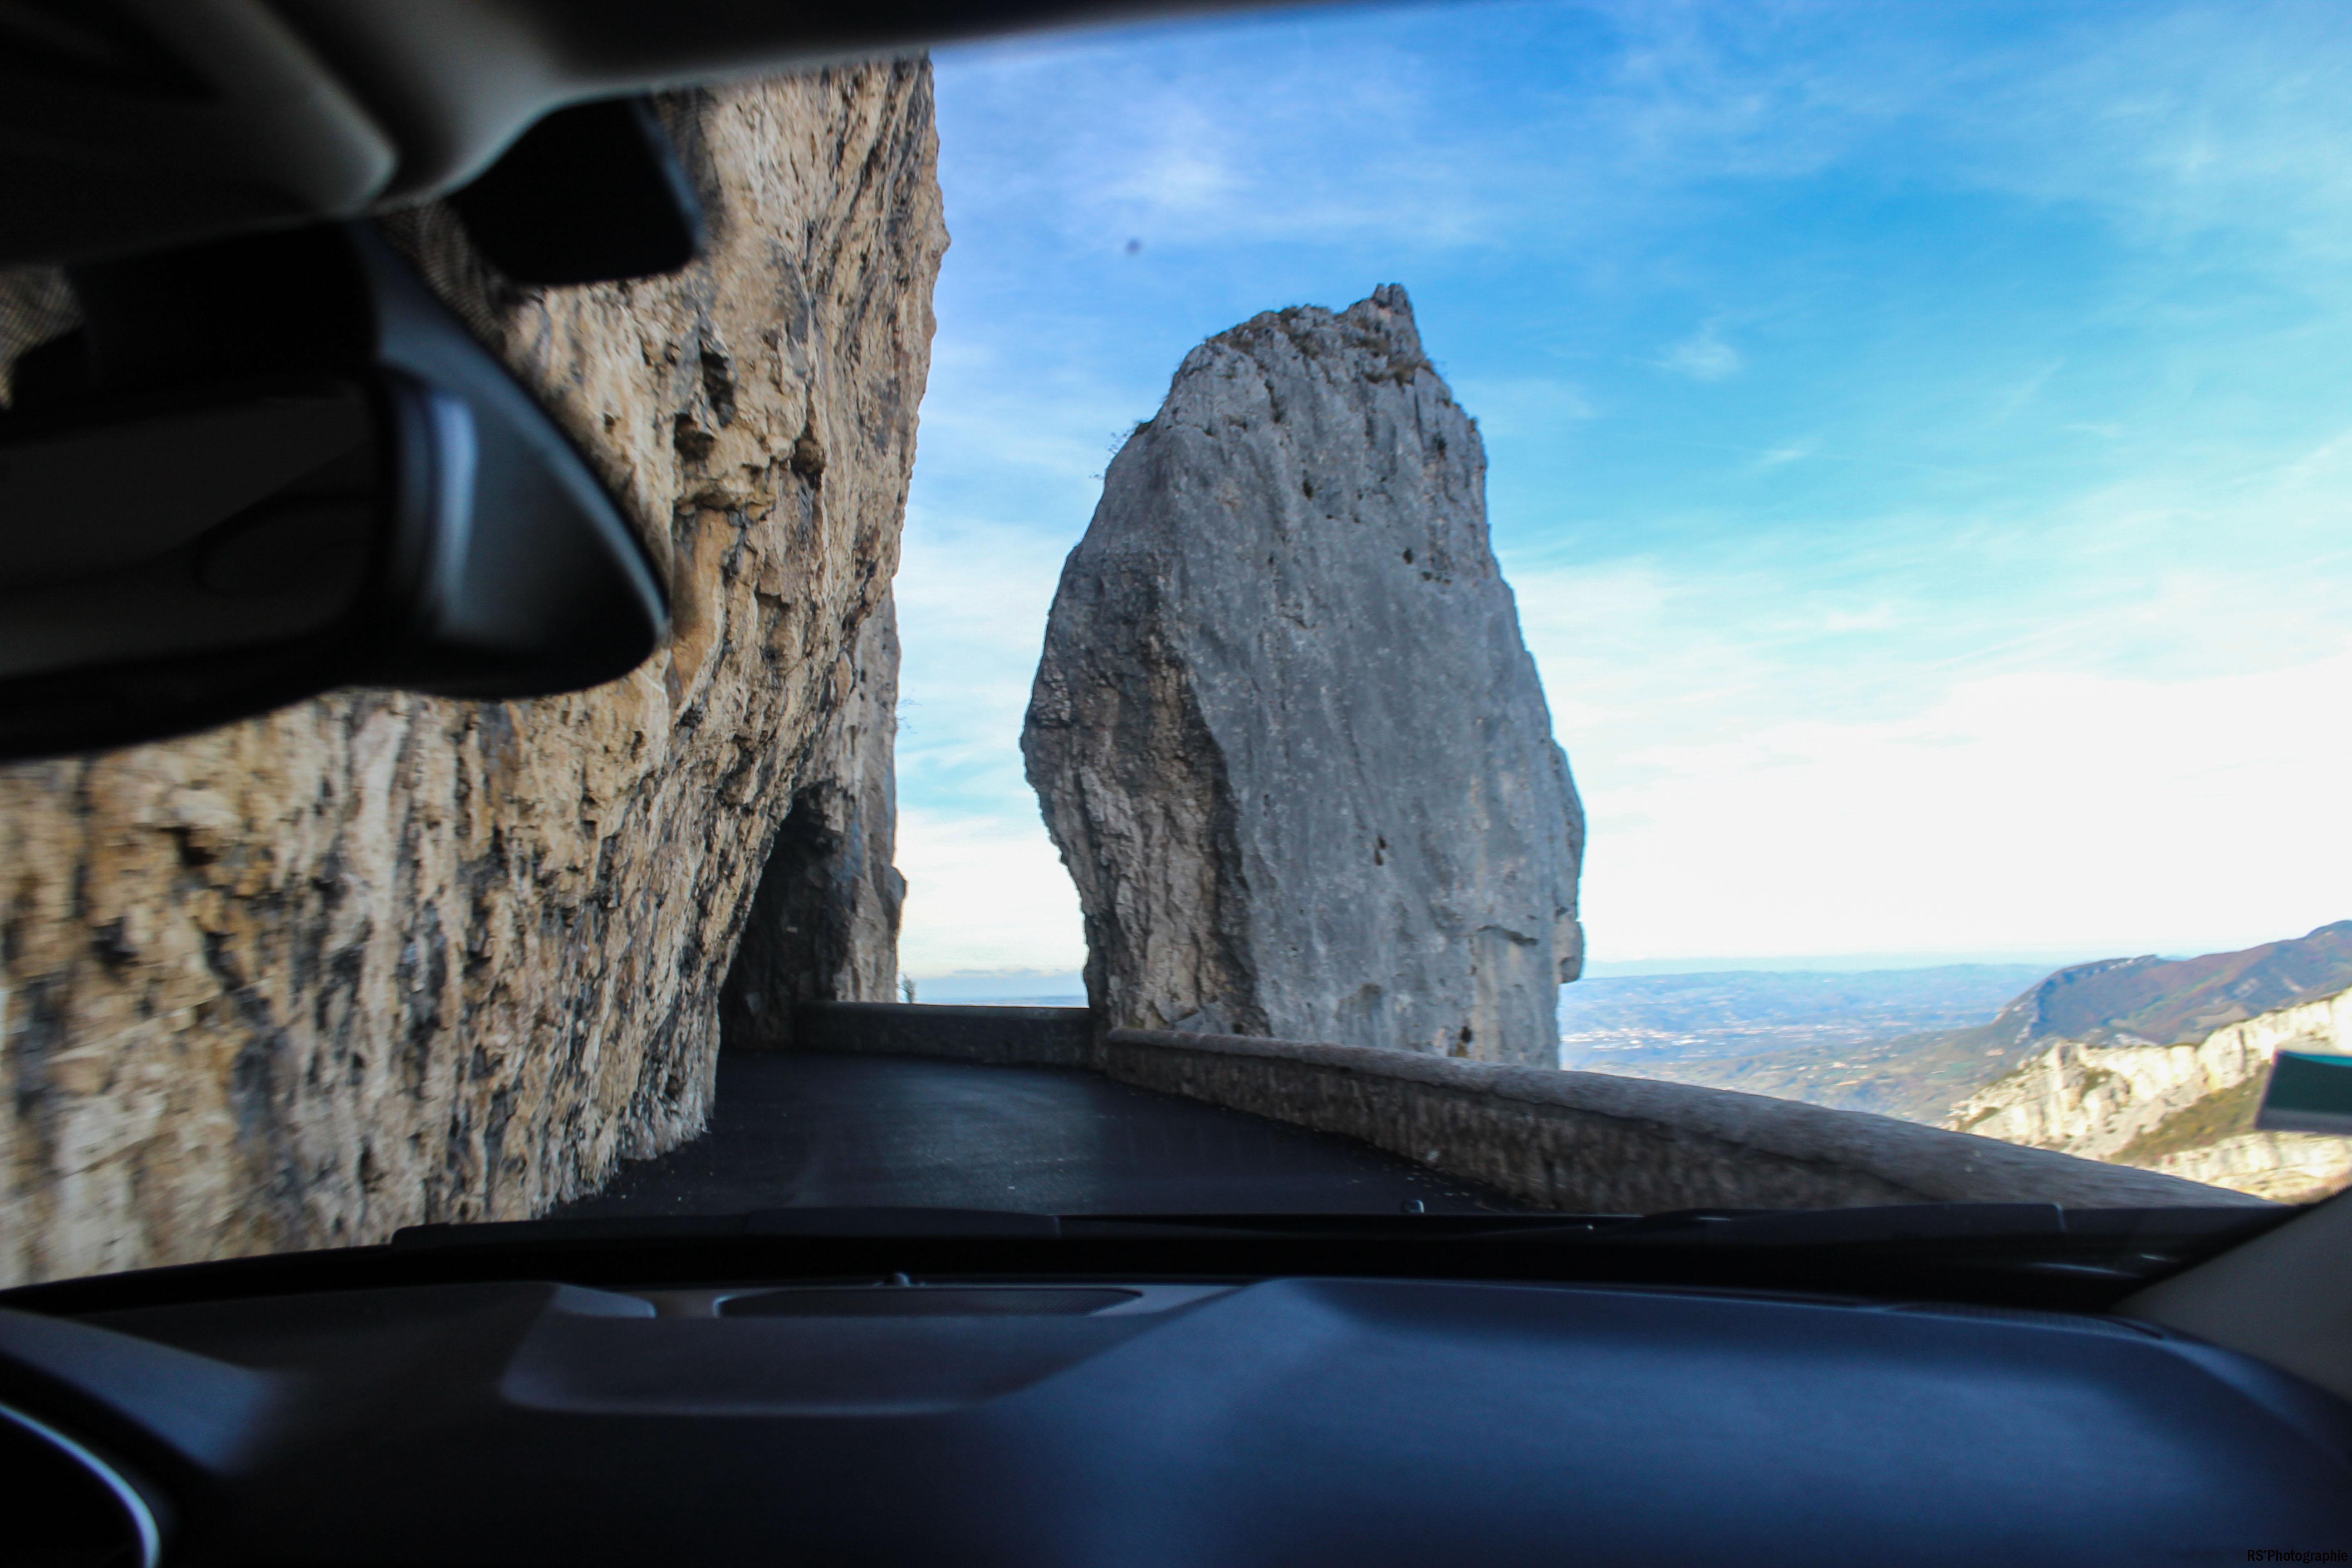 jeepcompass50-jeep-compass-intérieur-onboard-Arnaud Demasier-RSPhotographie